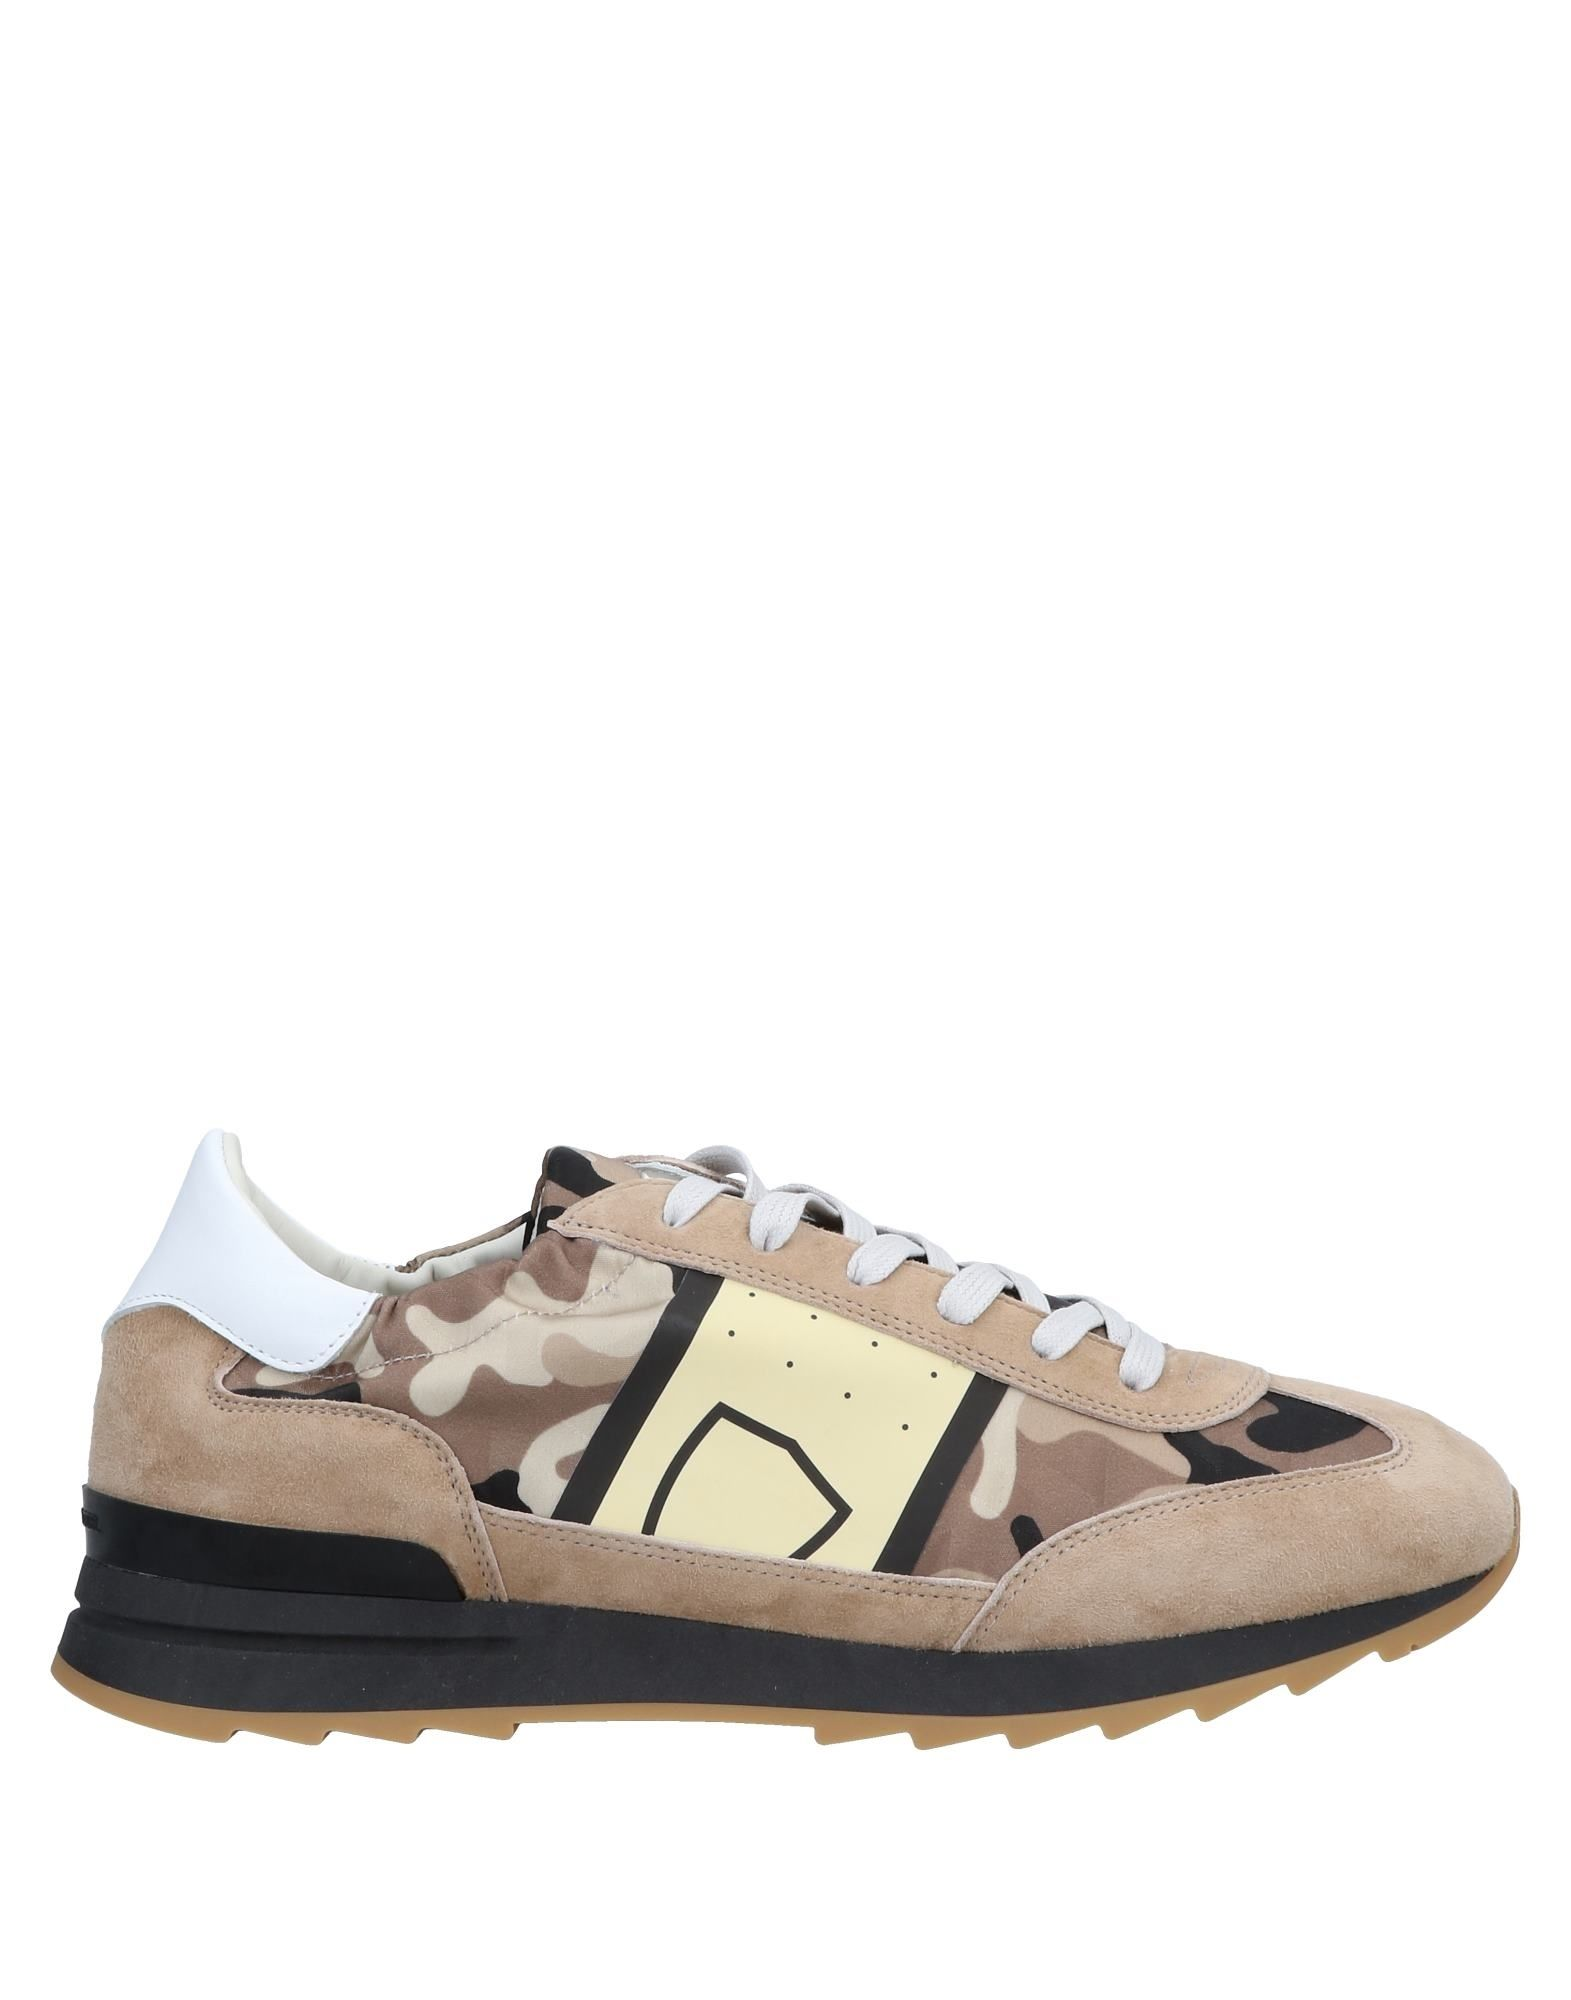 Philippe Model Model Sneakers - Men Philippe Model Model Sneakers online on  United Kingdom - 11564992MC 6e078b